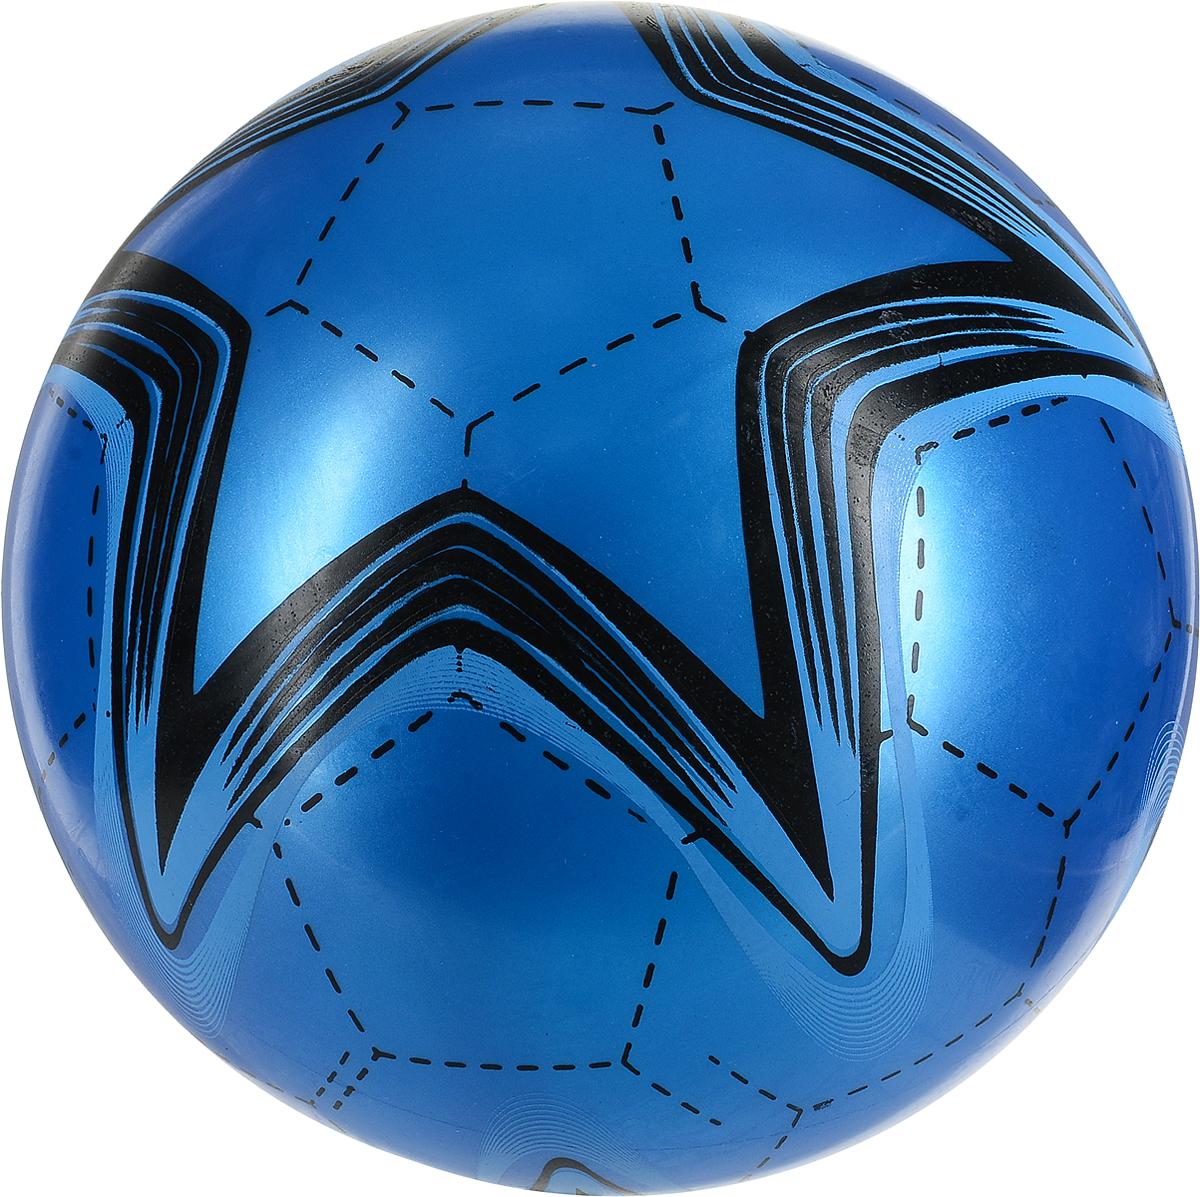 Забияка Мяч Звезда цвет синий 22 см